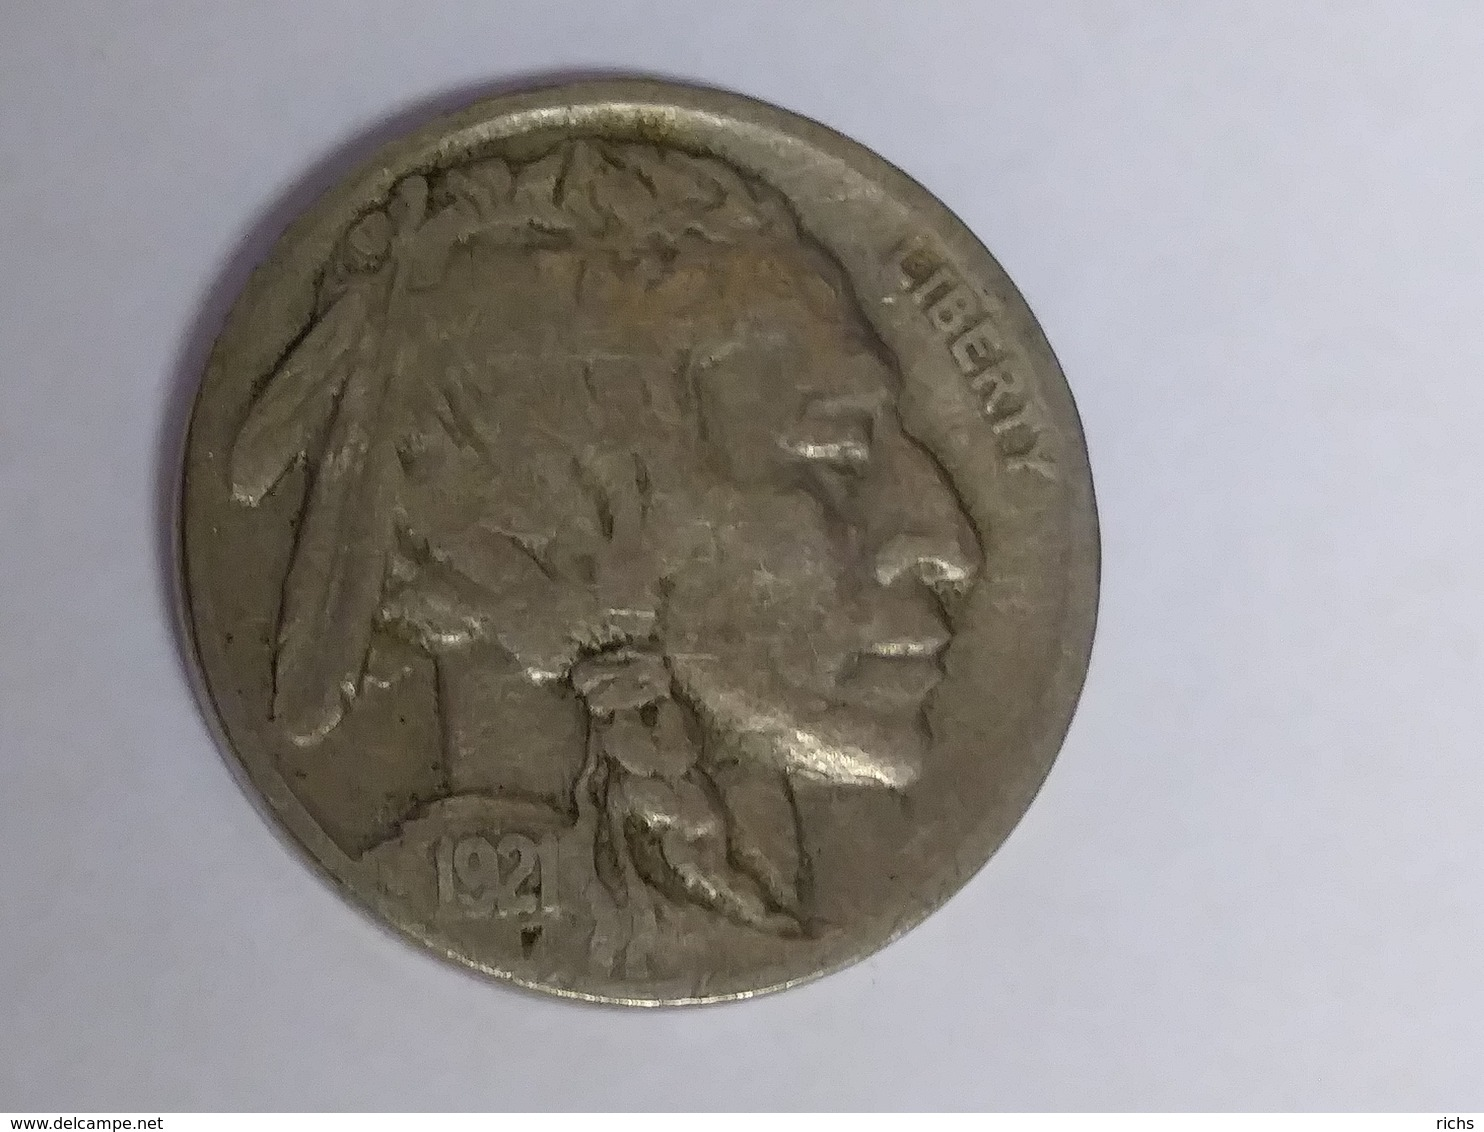 1921 Buffalo Nickel - Federal Issues